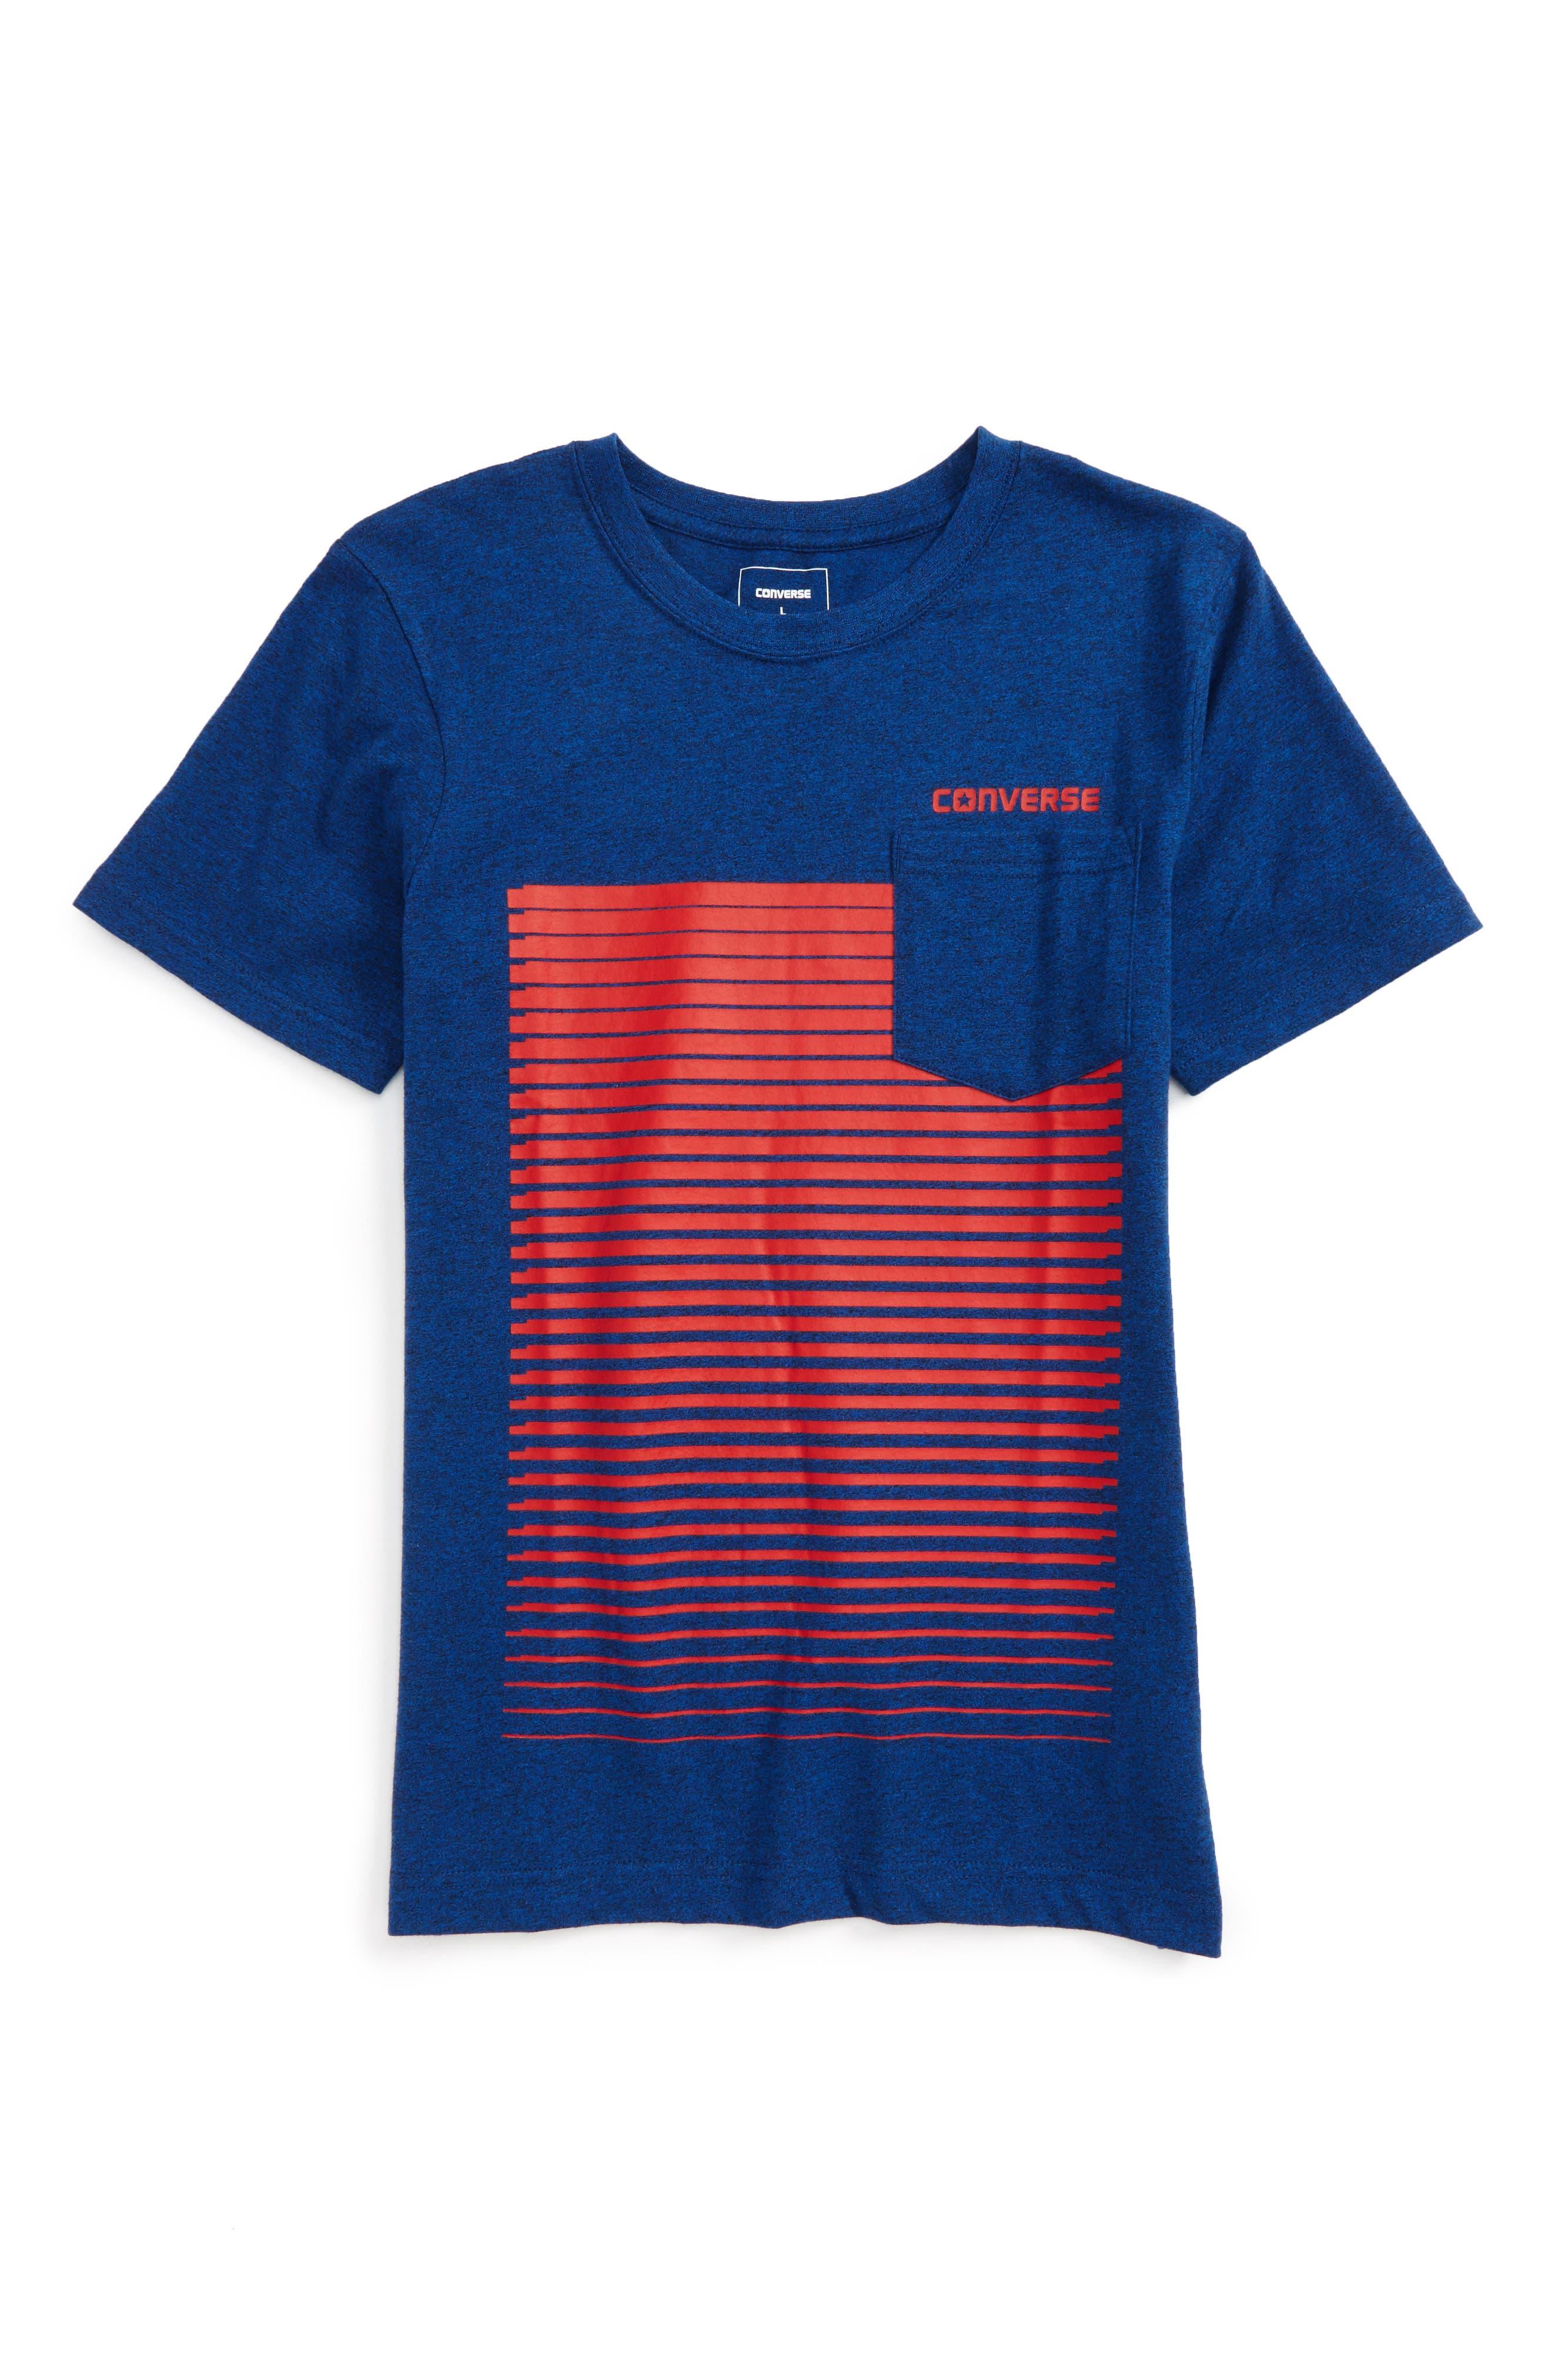 Main Image - Converse Linear Ombré Pocket T-Shirt (Big Boys)